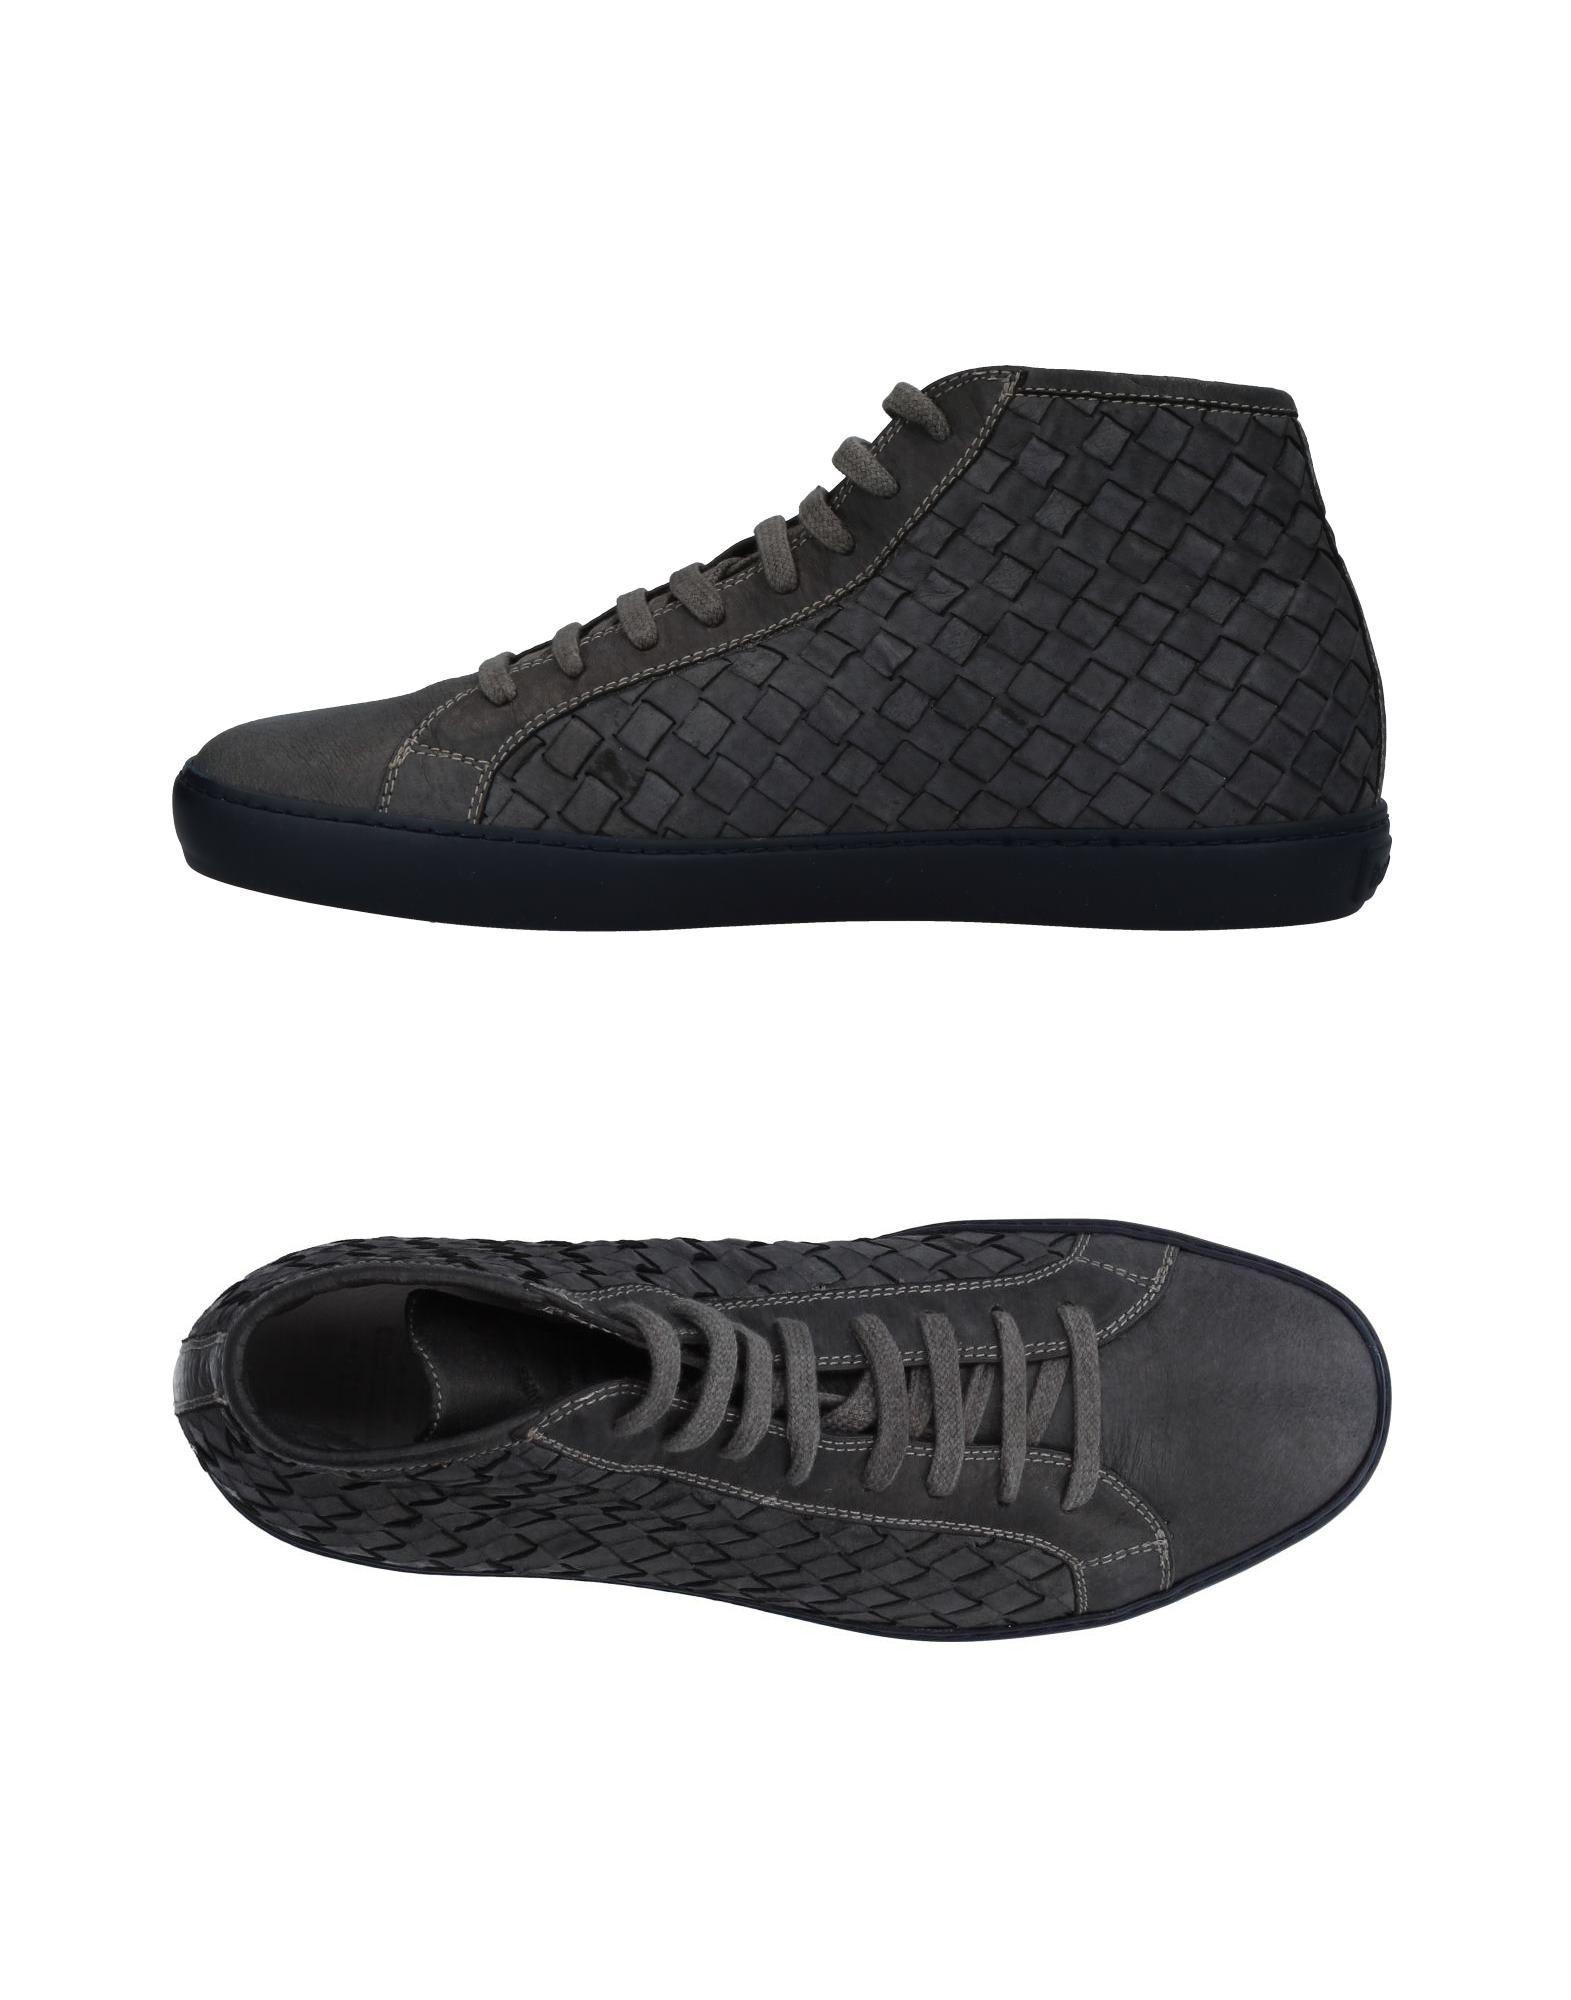 Pantofola D'oro Sneakers Herren  11366241OH 11366241OH  5c8ca7